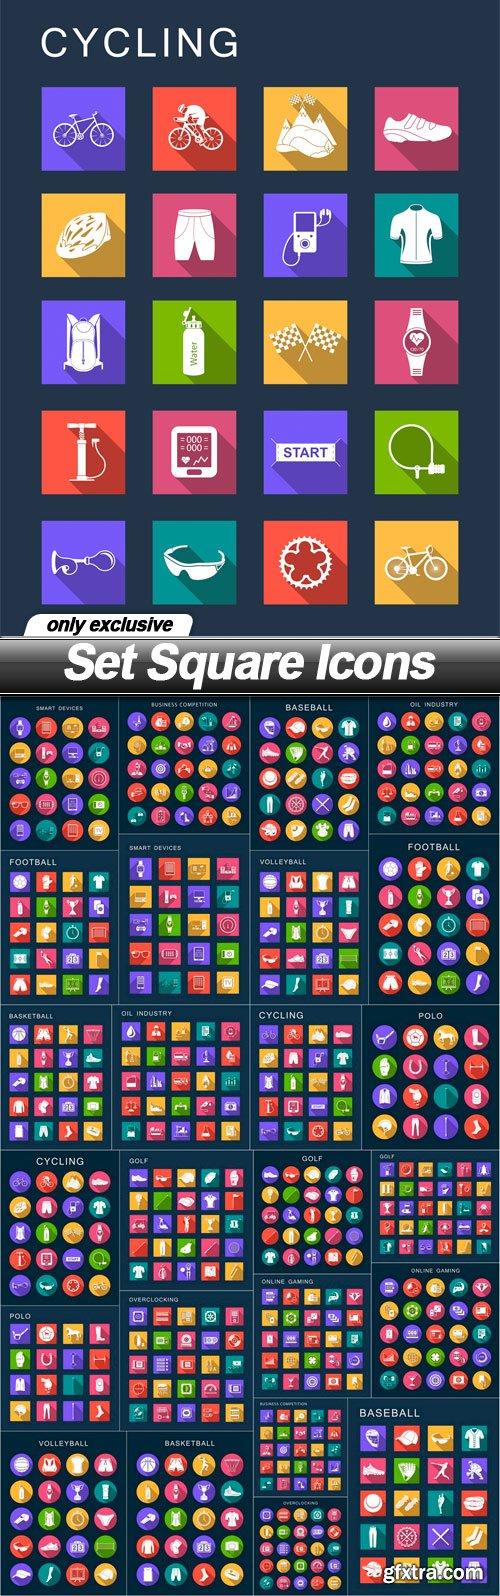 Set Square Icons - 25 EPS